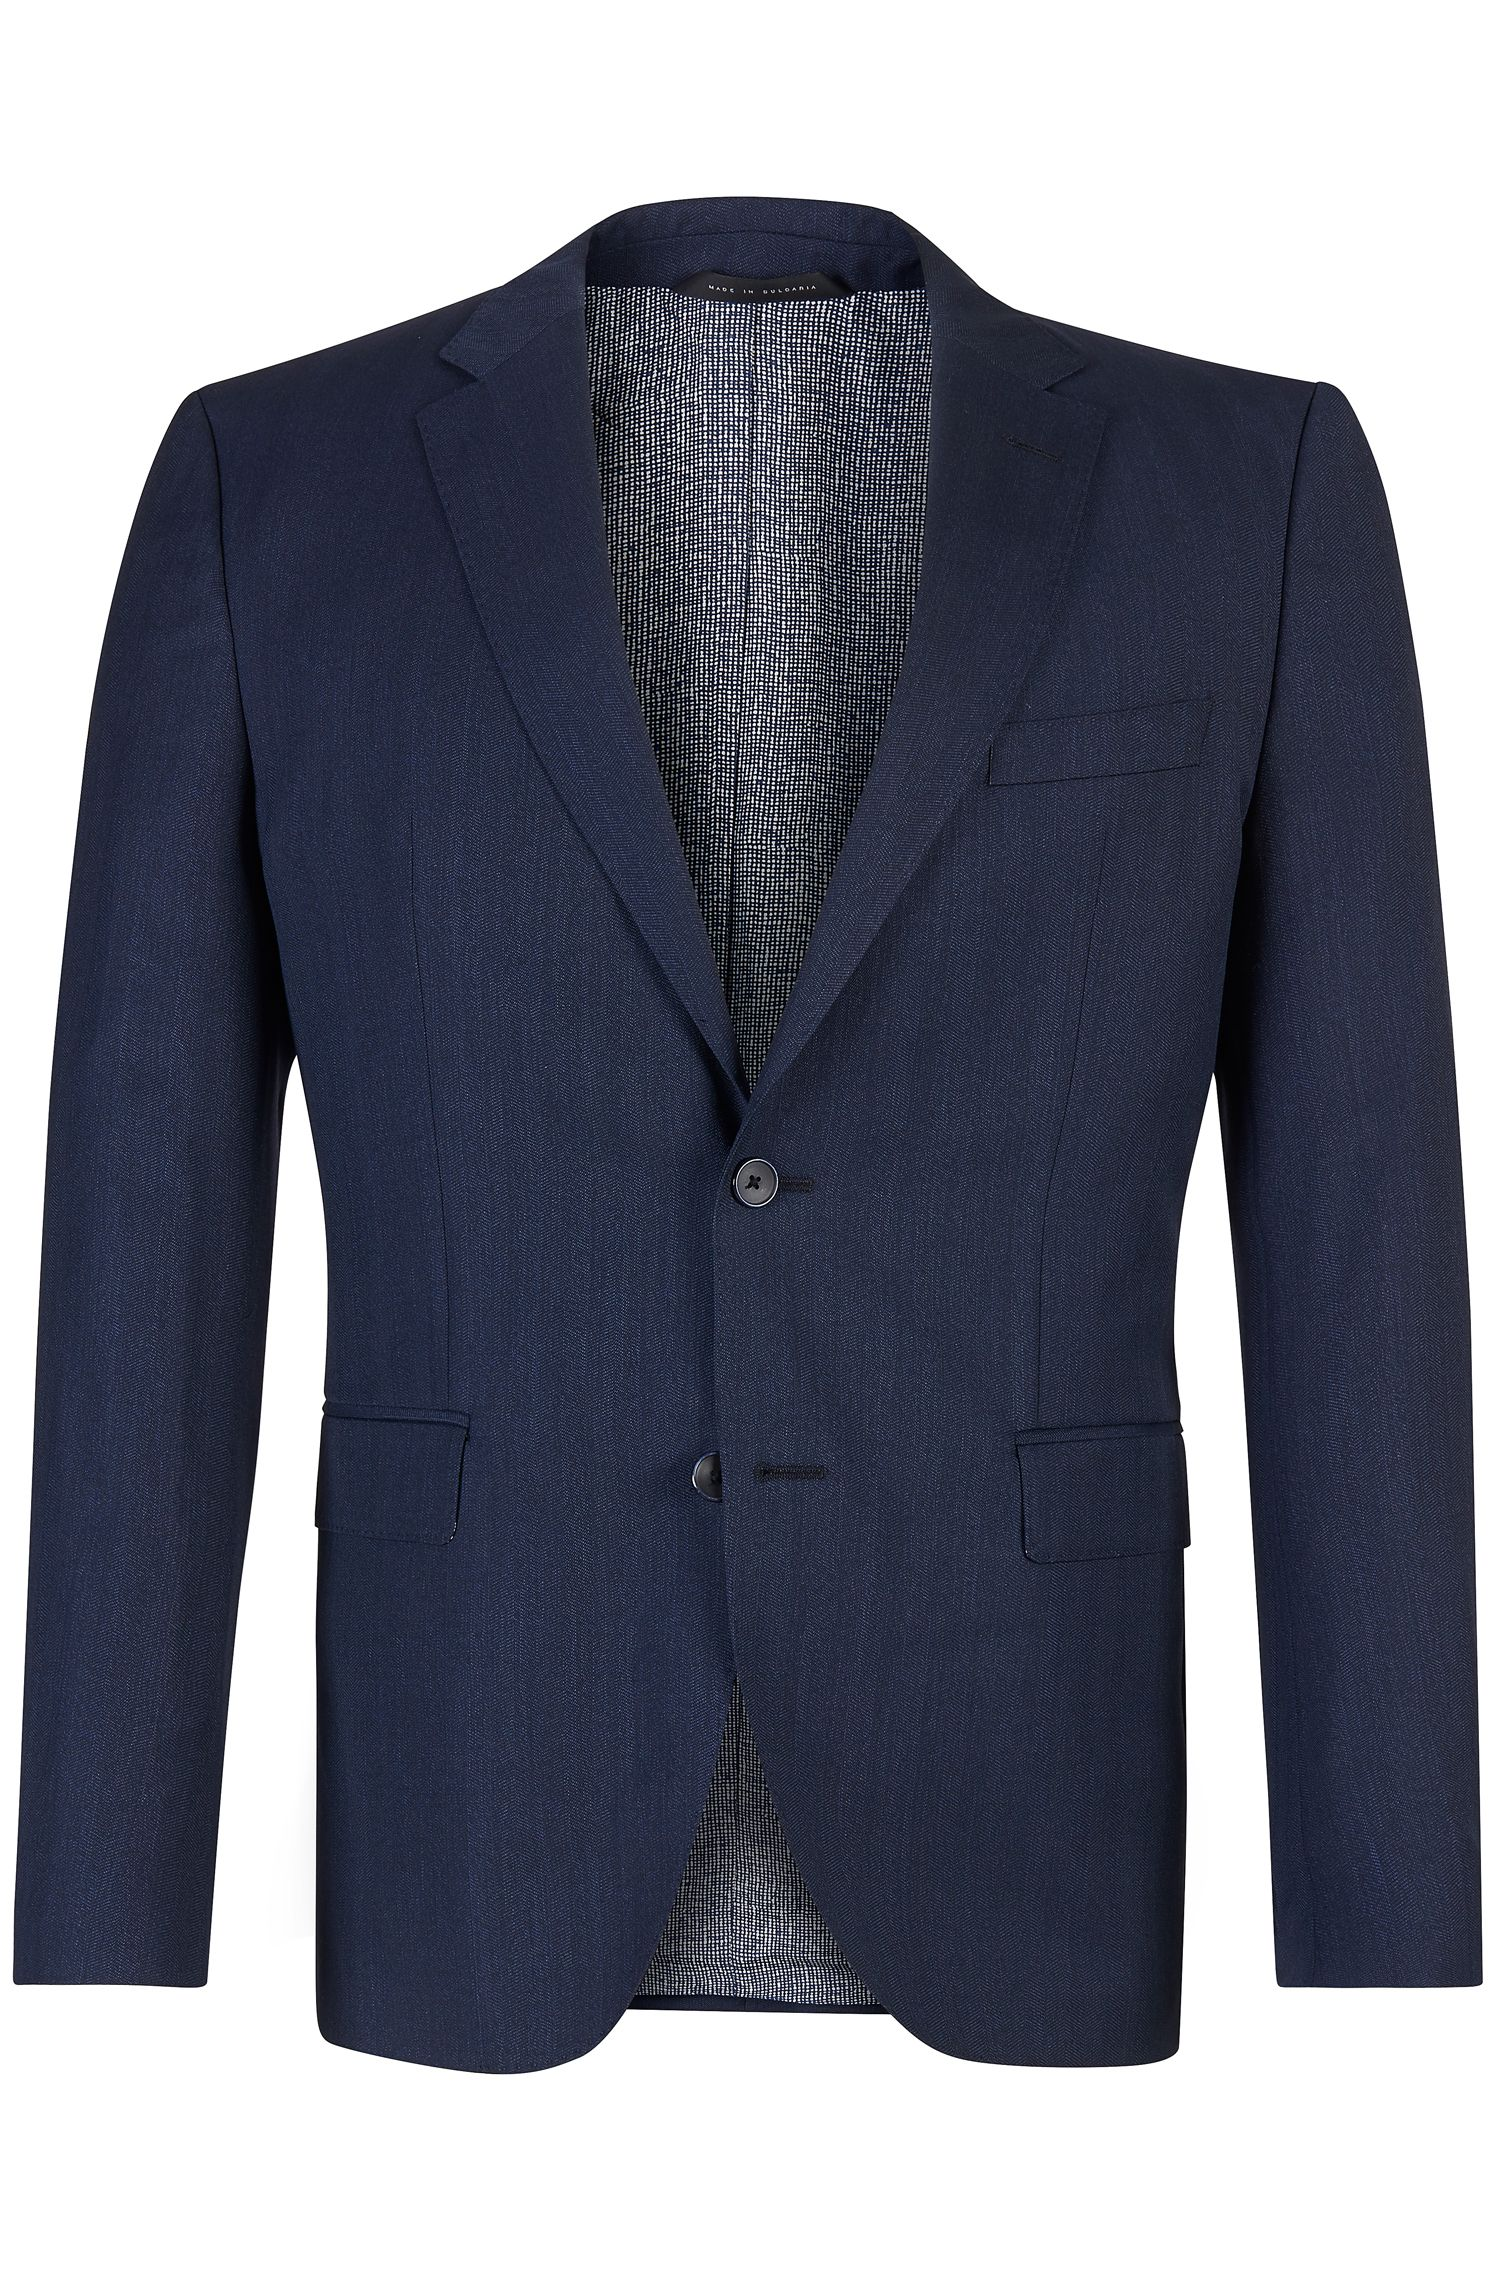 'Jewels' | Regular Fit, Italian Wool Herringbone Sport Coat